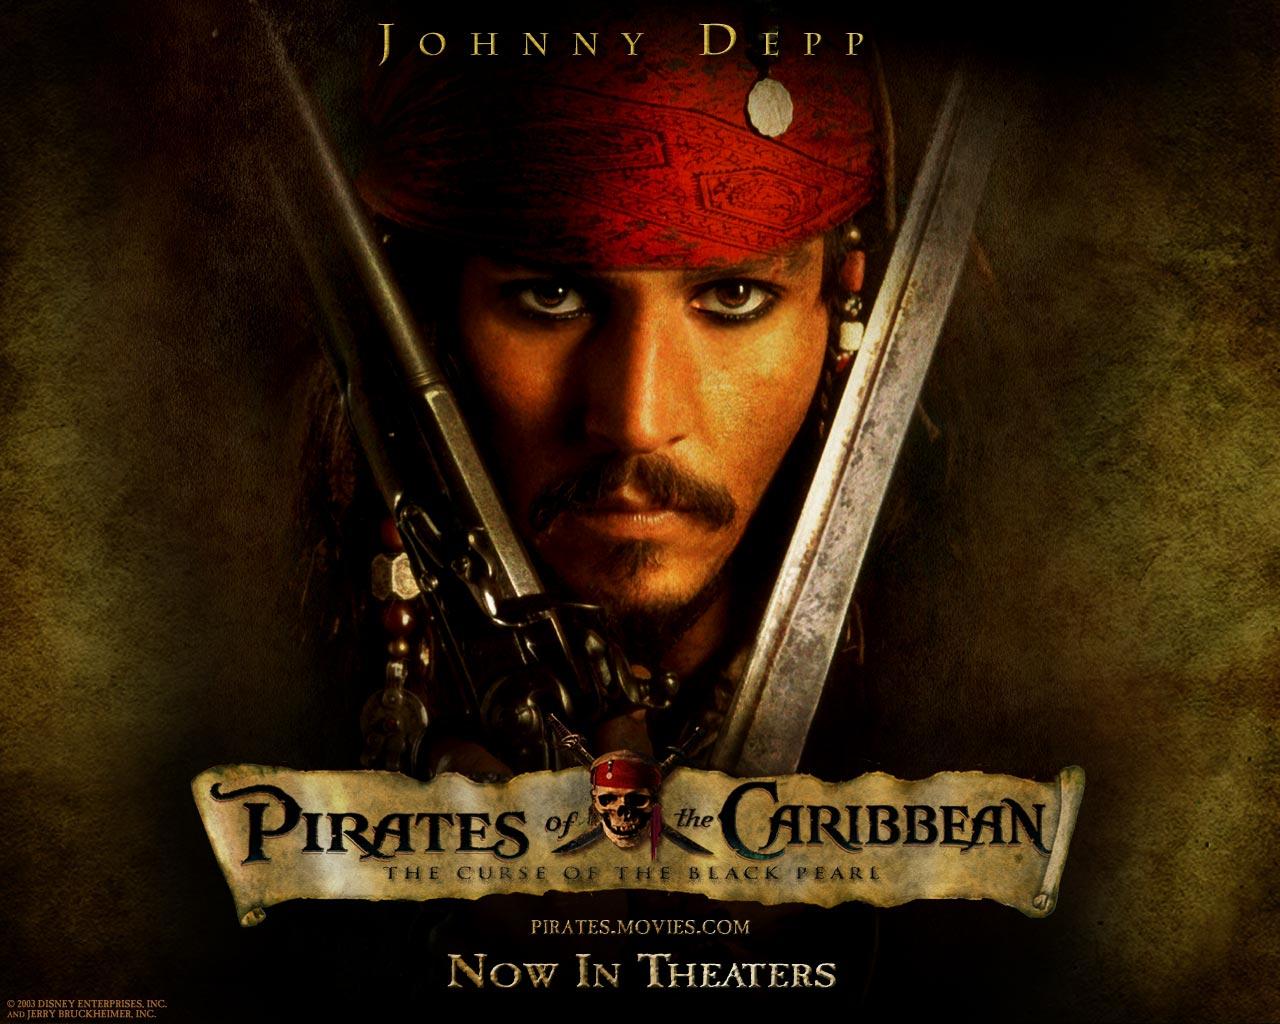 http://2.bp.blogspot.com/-rdTNW2Msozg/Td5db_OcJJI/AAAAAAAAAgA/o0hHEamgPfU/s1600/Piratas-caribe%2528quewallpapers.com%2529.jpg